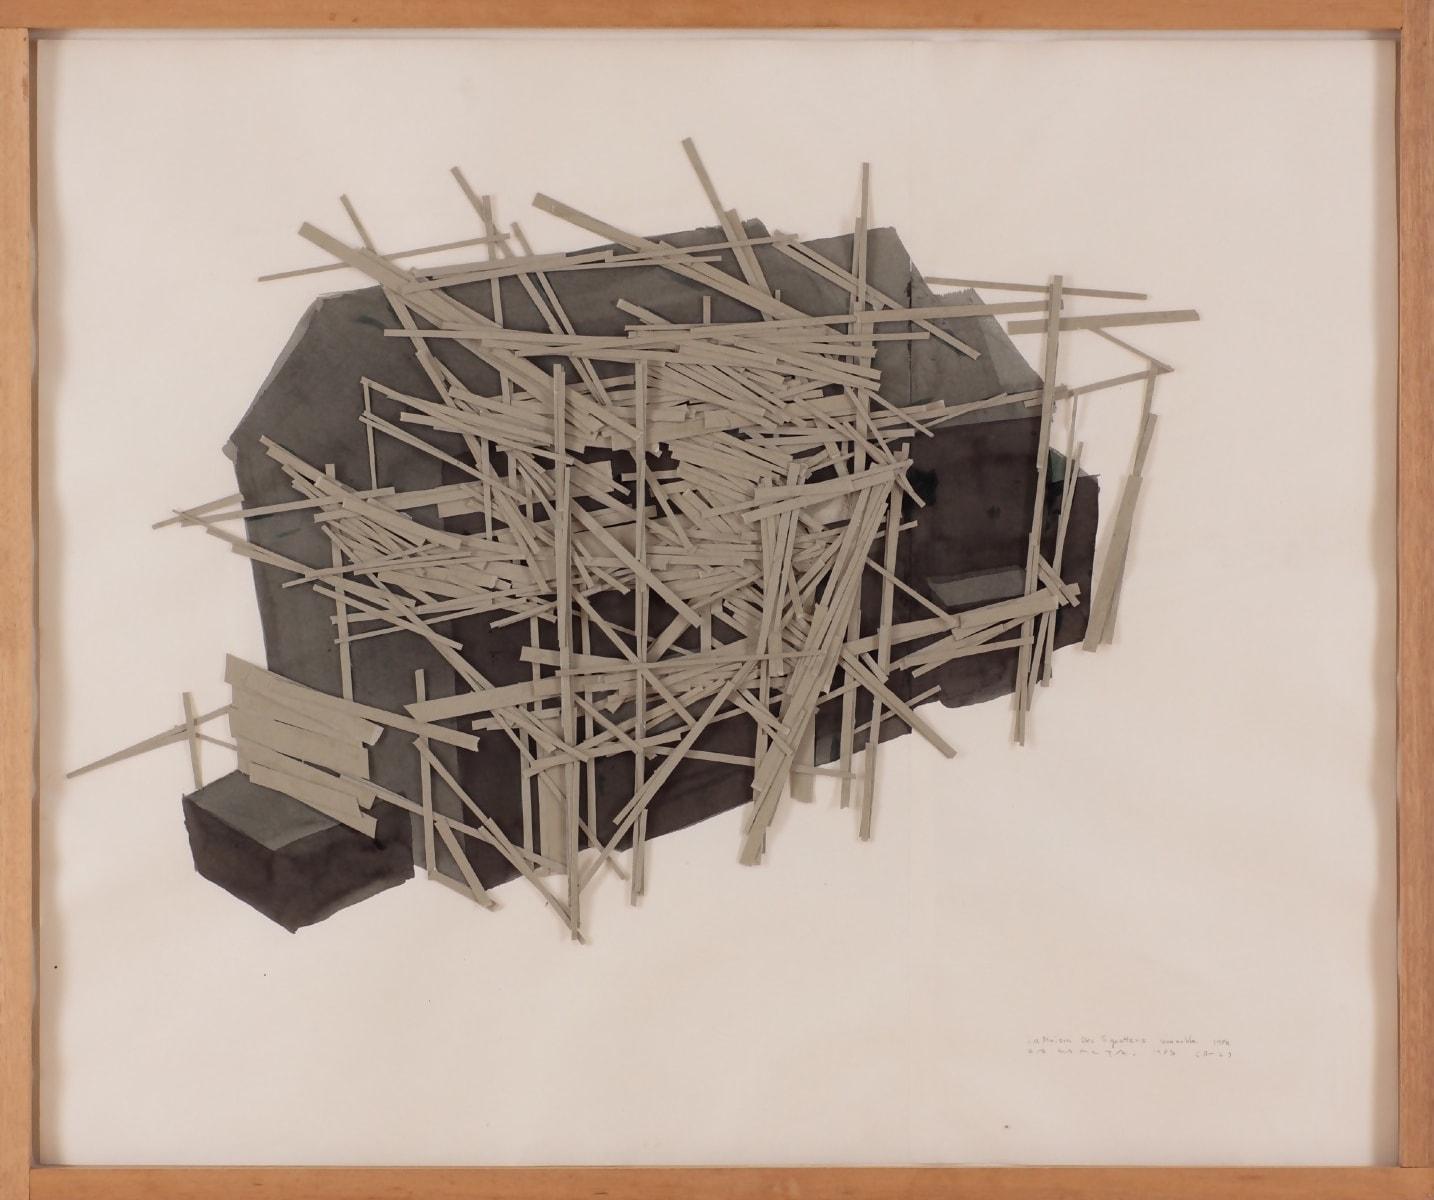 La Maison des Squatters, Grenoble Plan B-2 by Tadashi Kawamata